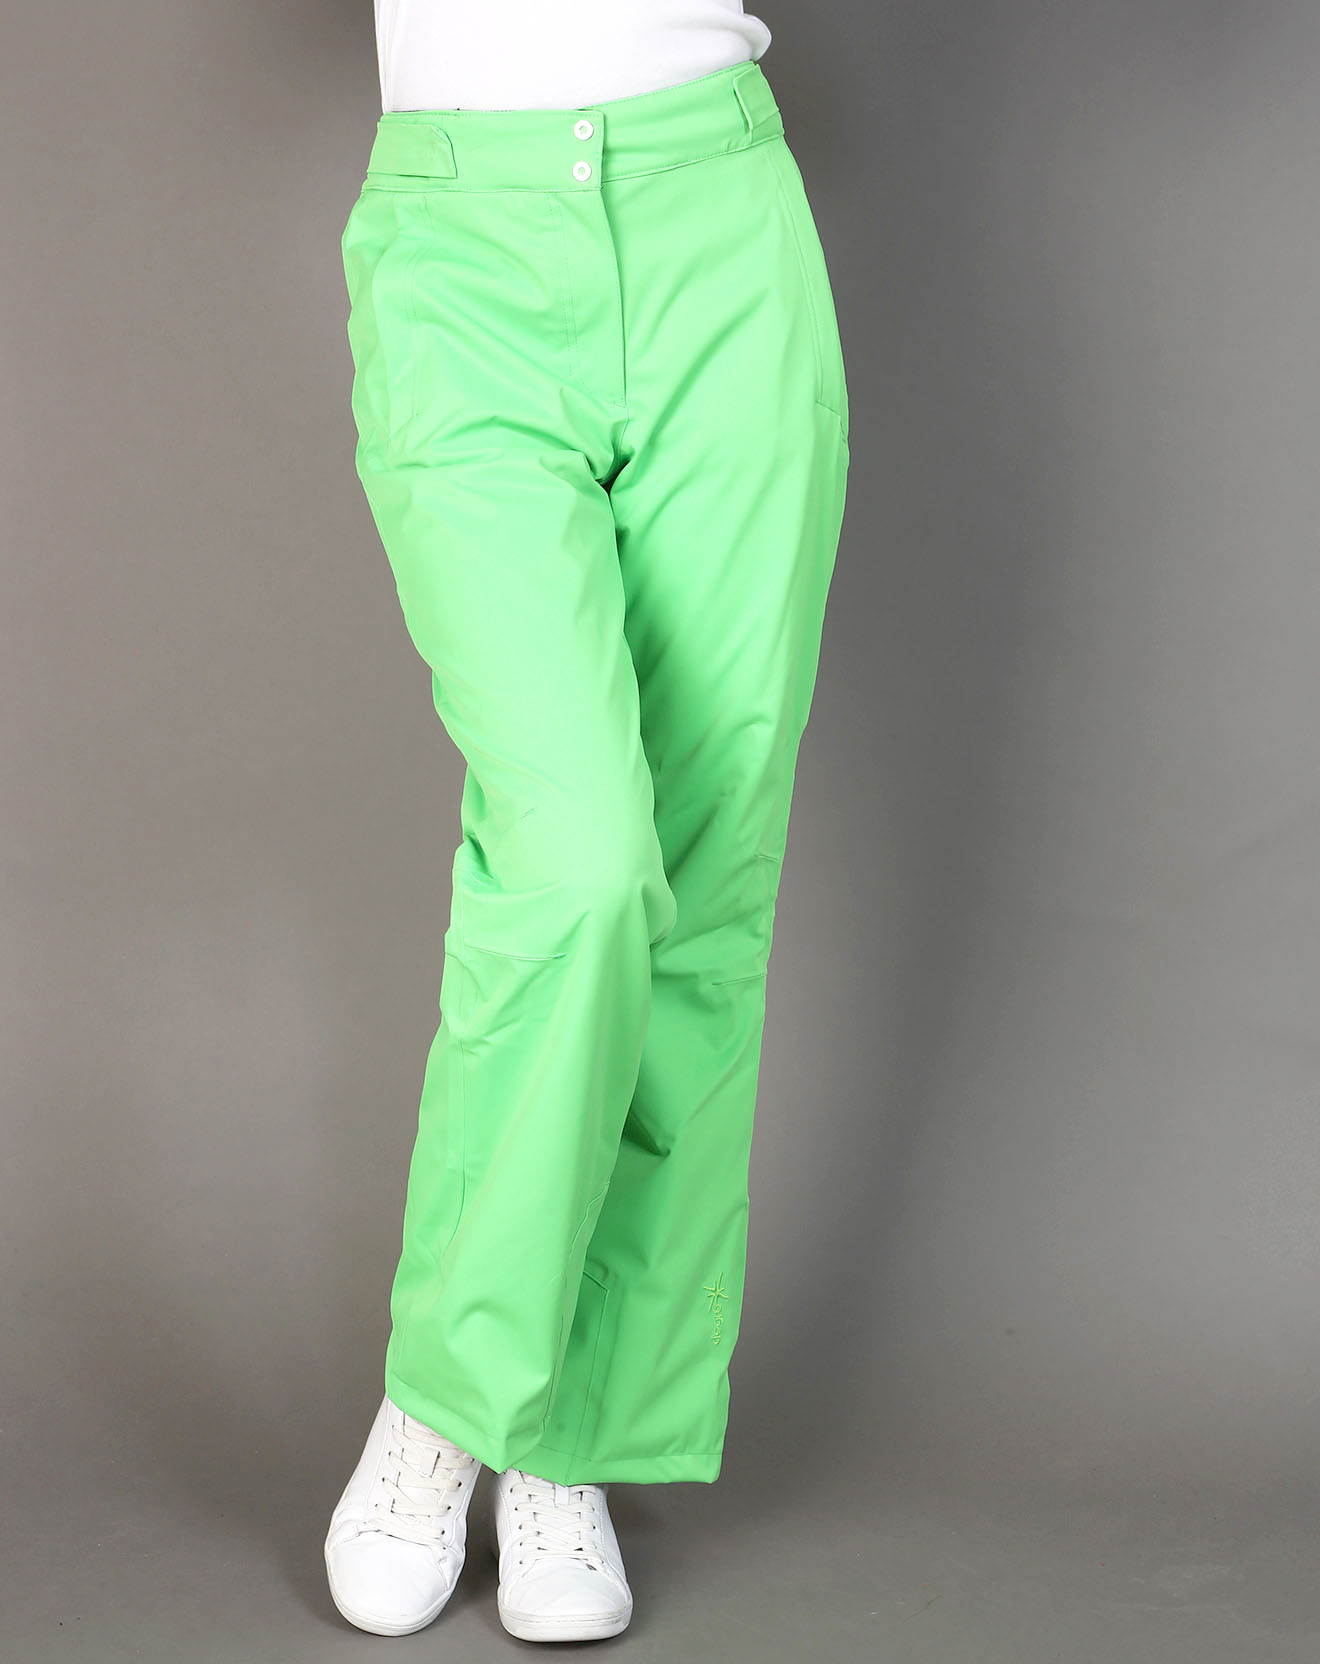 Pantalon de ski climset neon vert